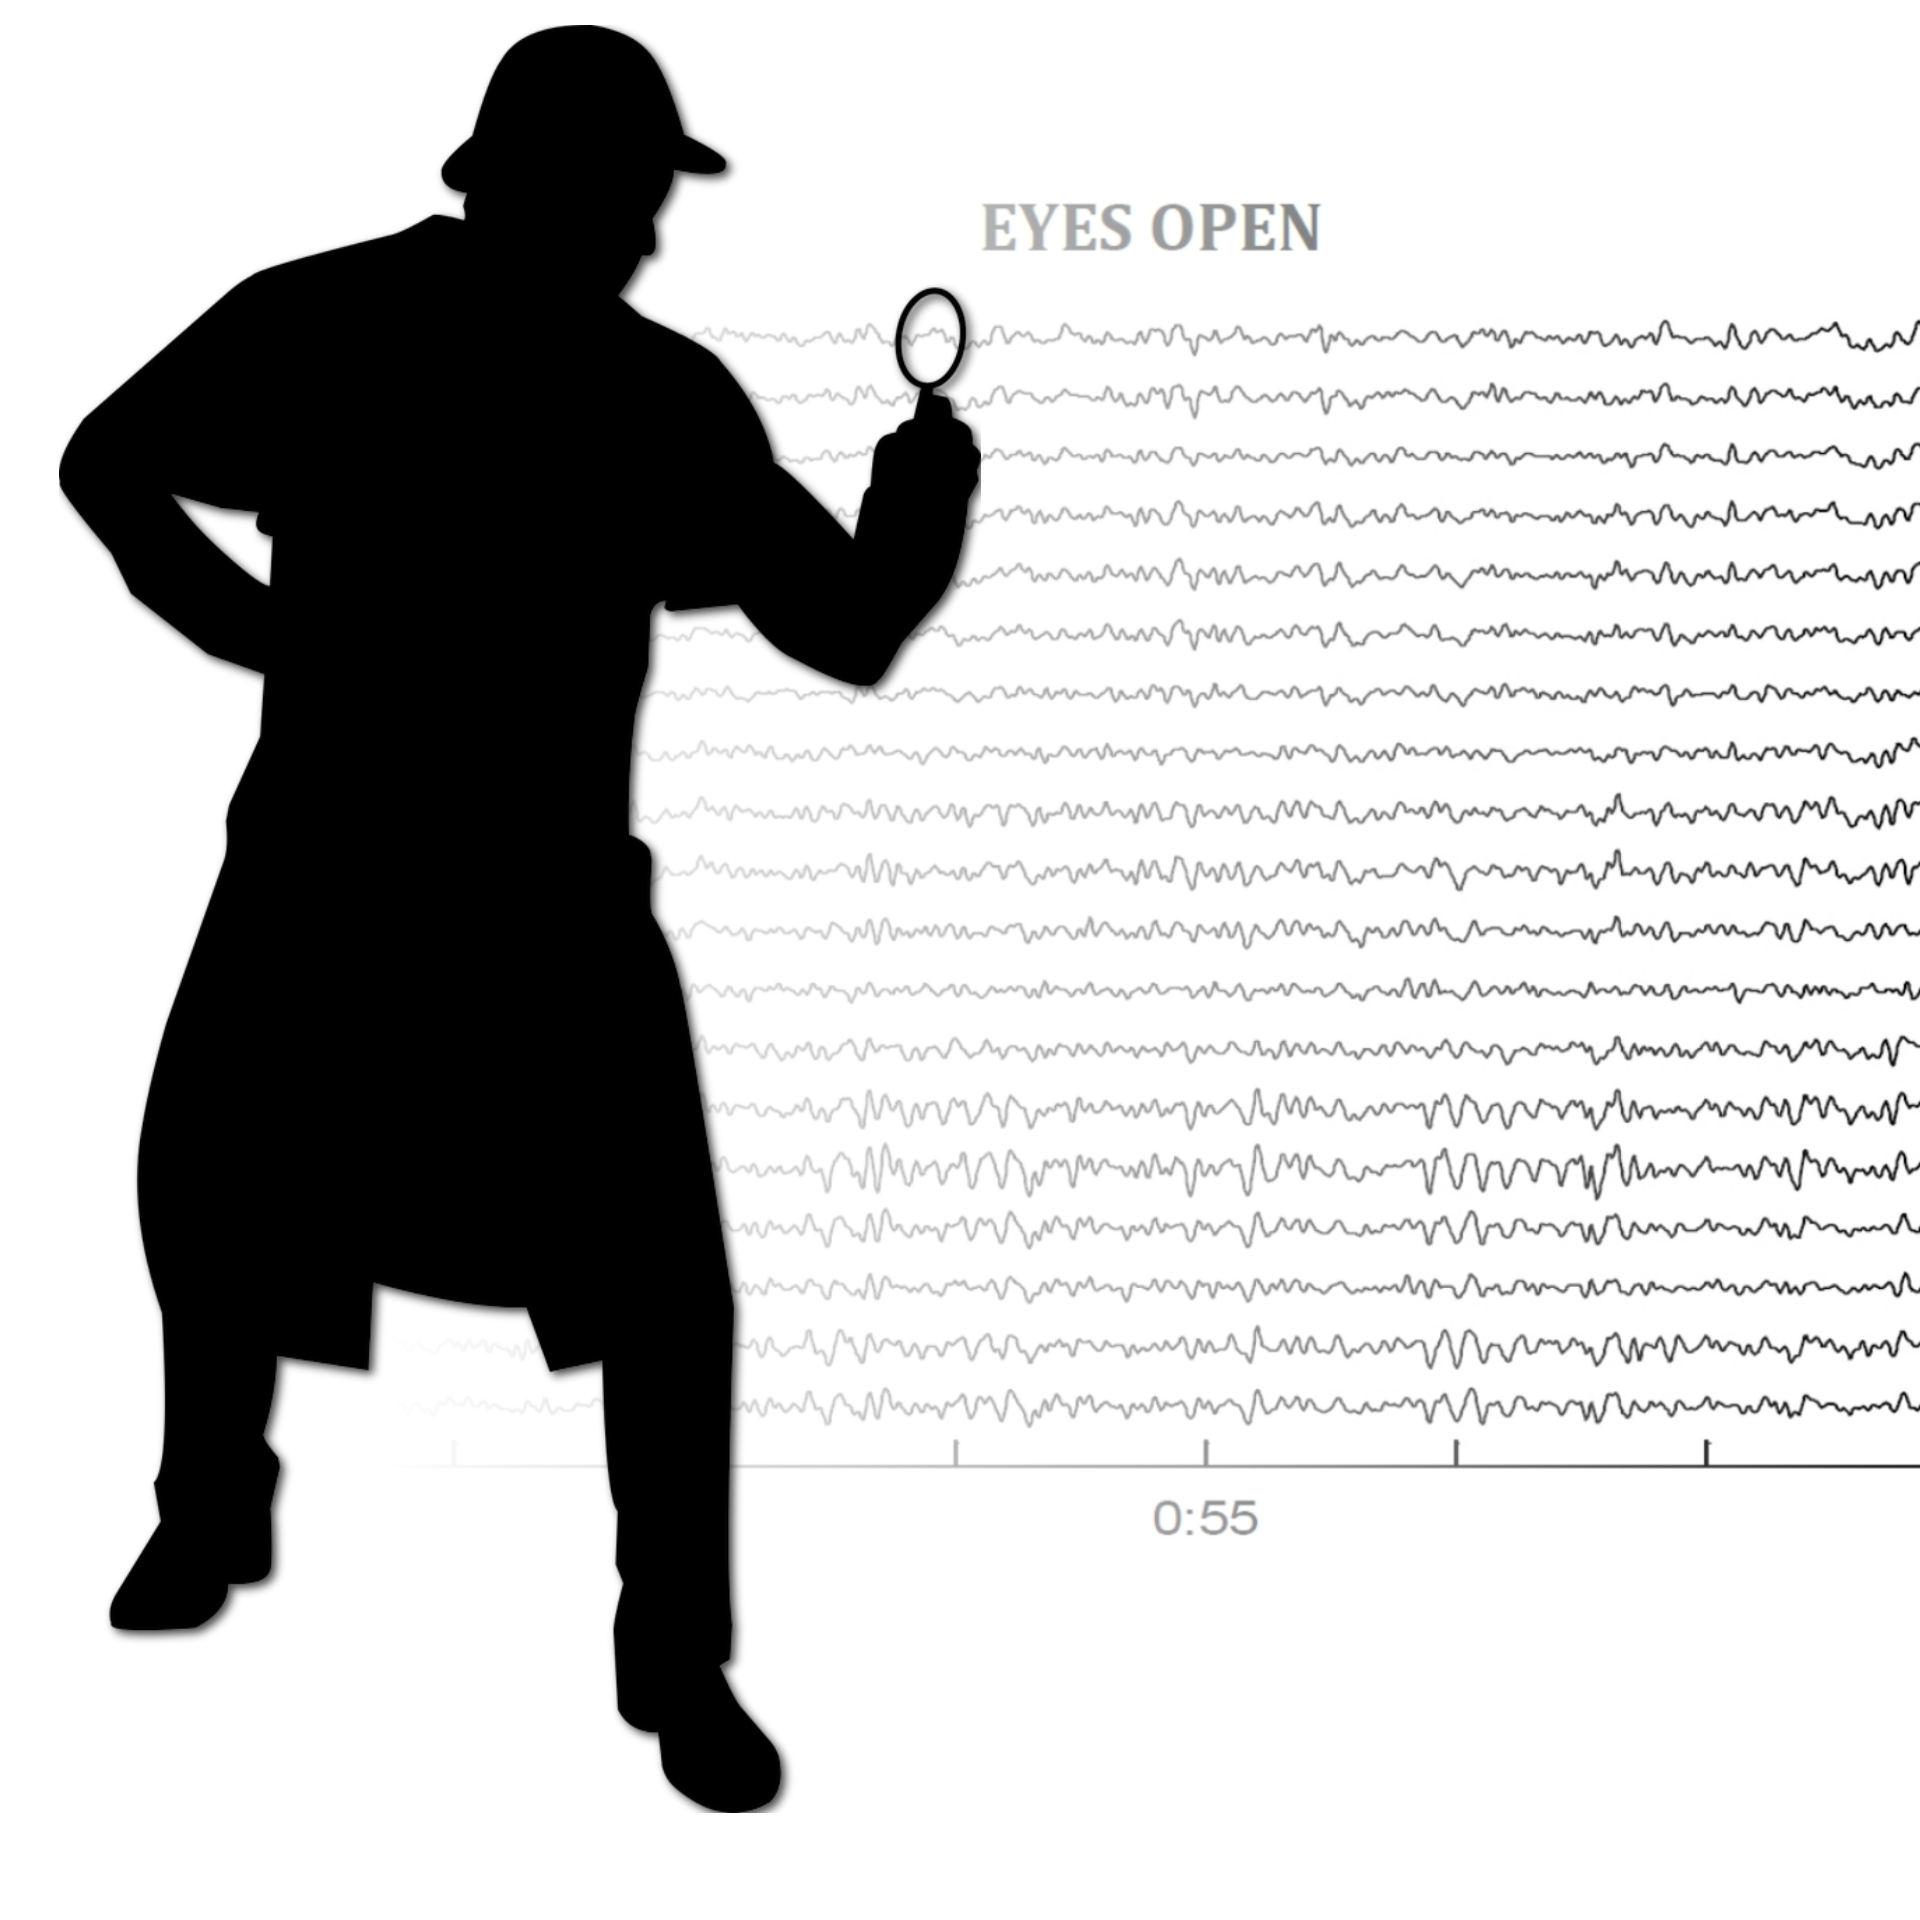 Sherlock Holmes silhouette over my eyes open EEG reading.